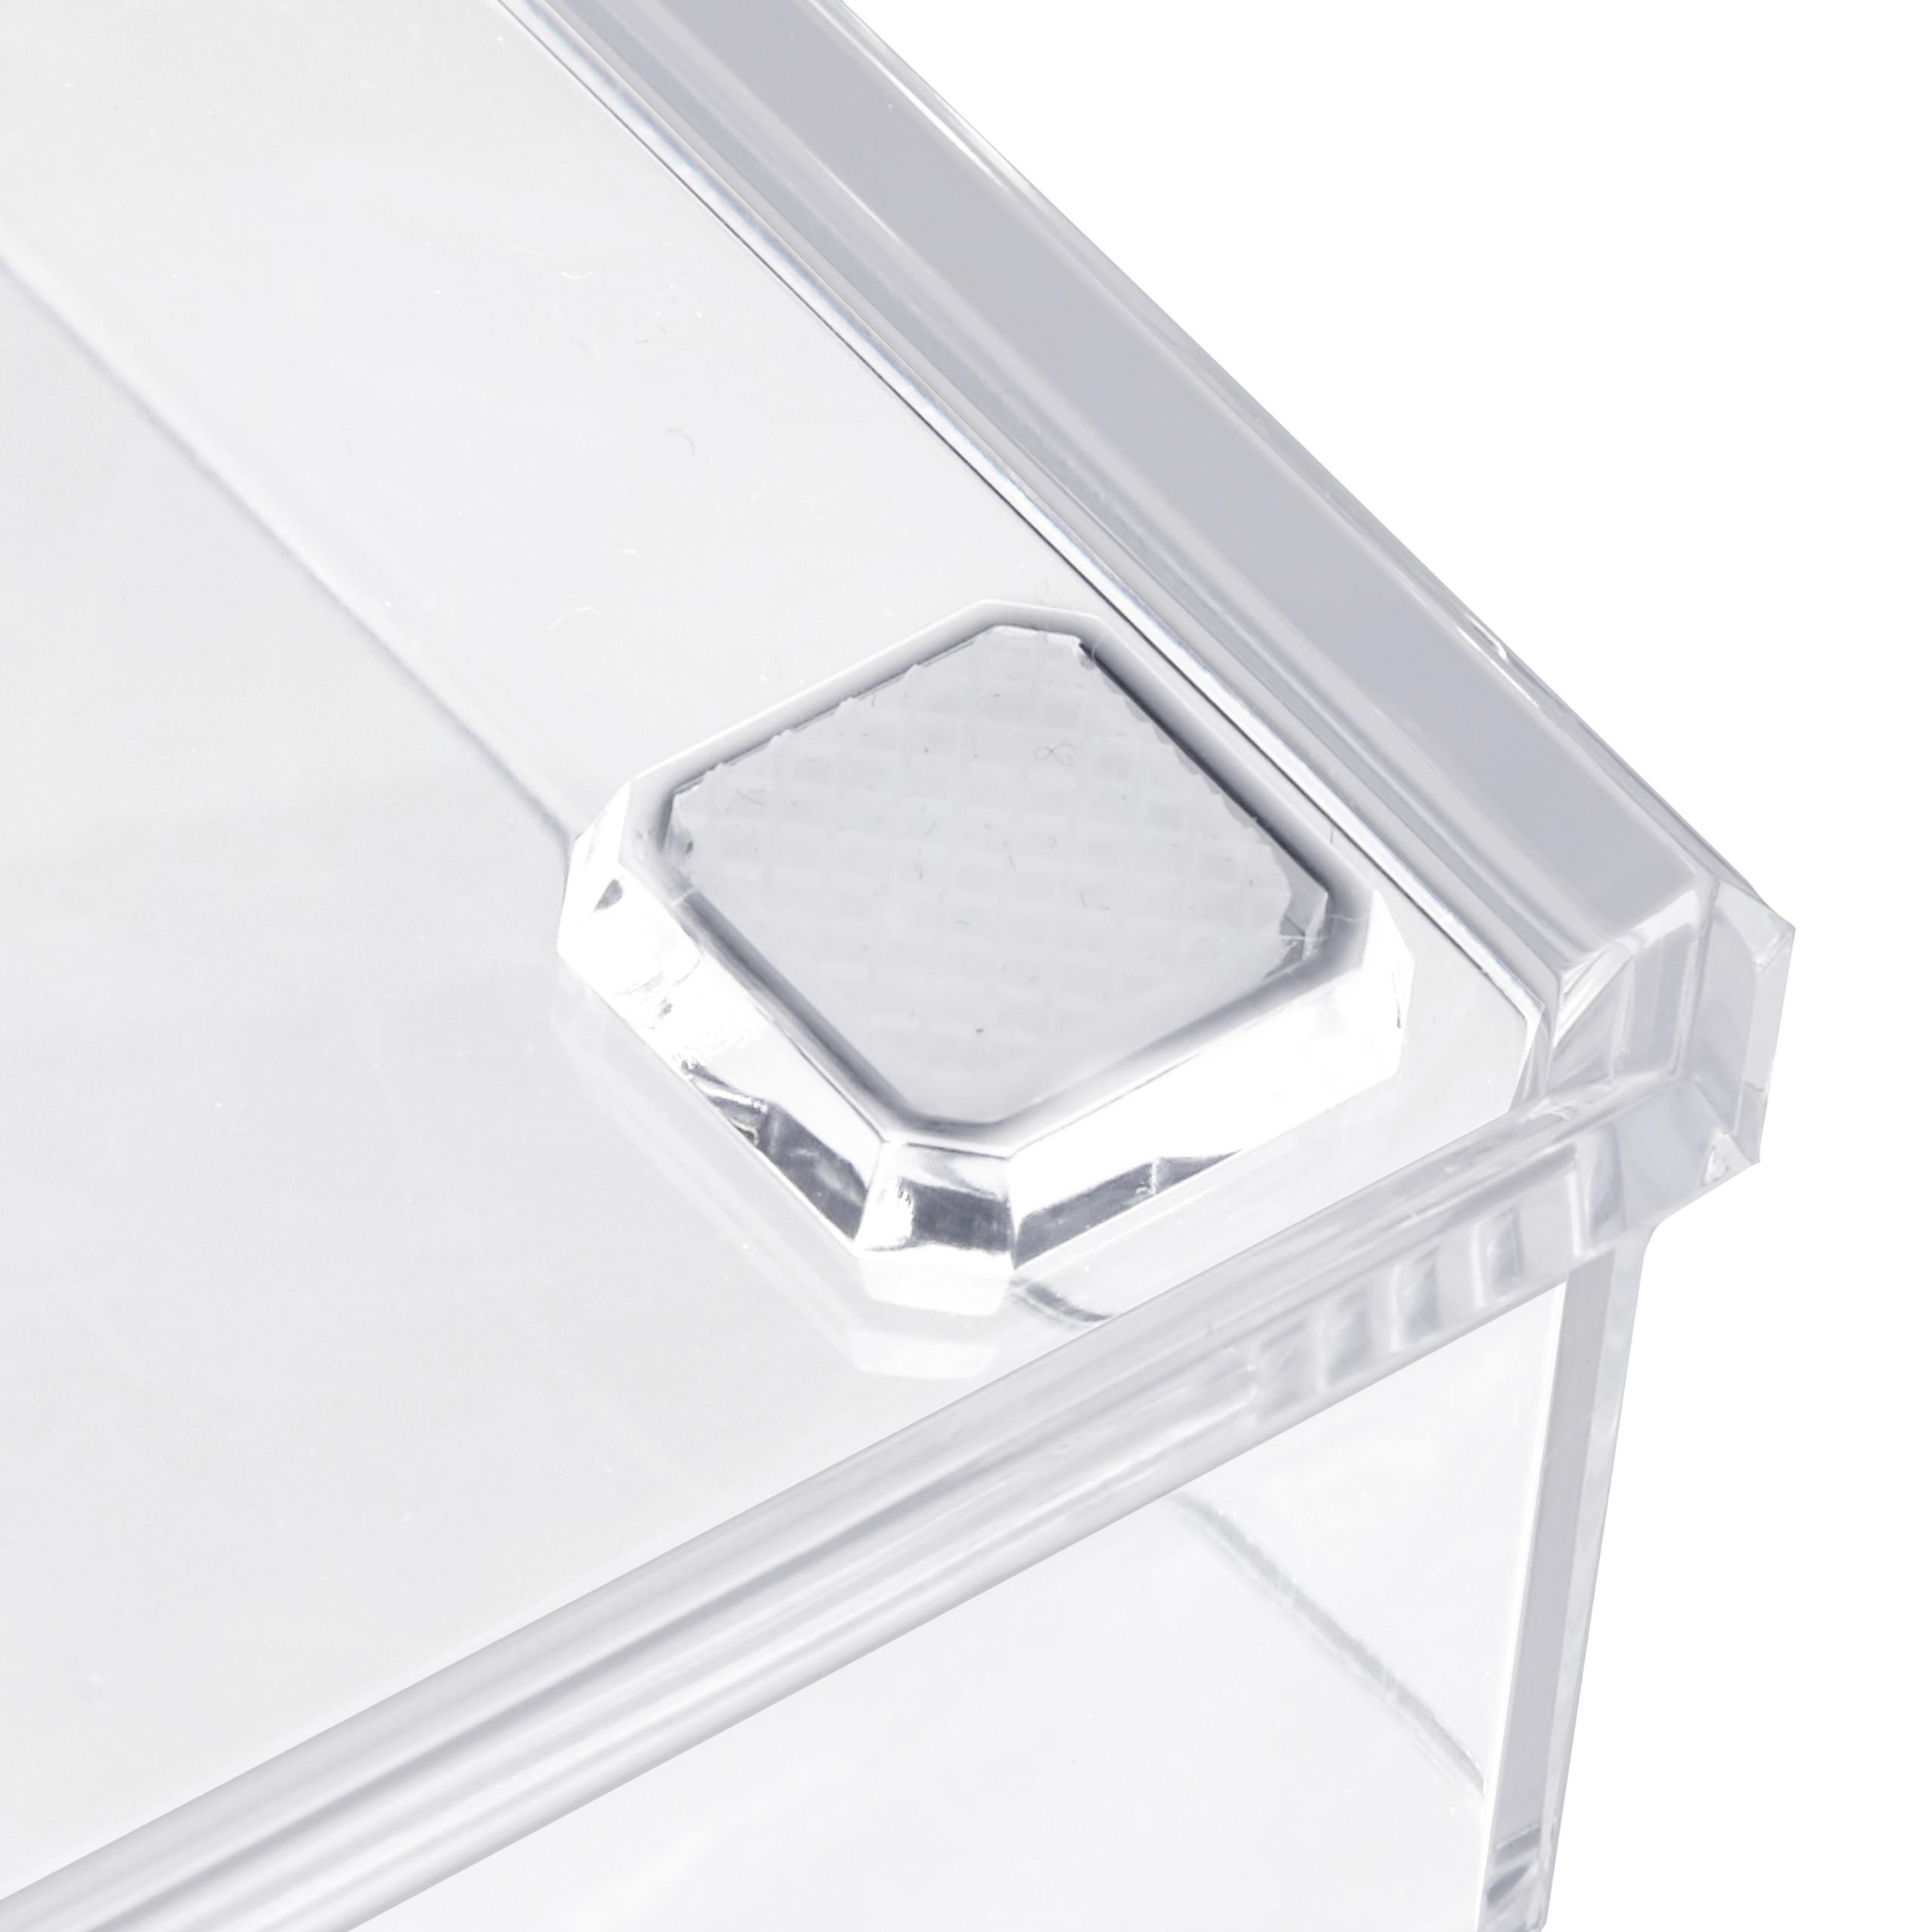 make-up-organizer-met-6-lades-acryl-cosmeticahouder-make-up-cosmetica-opslag miniatuur 9